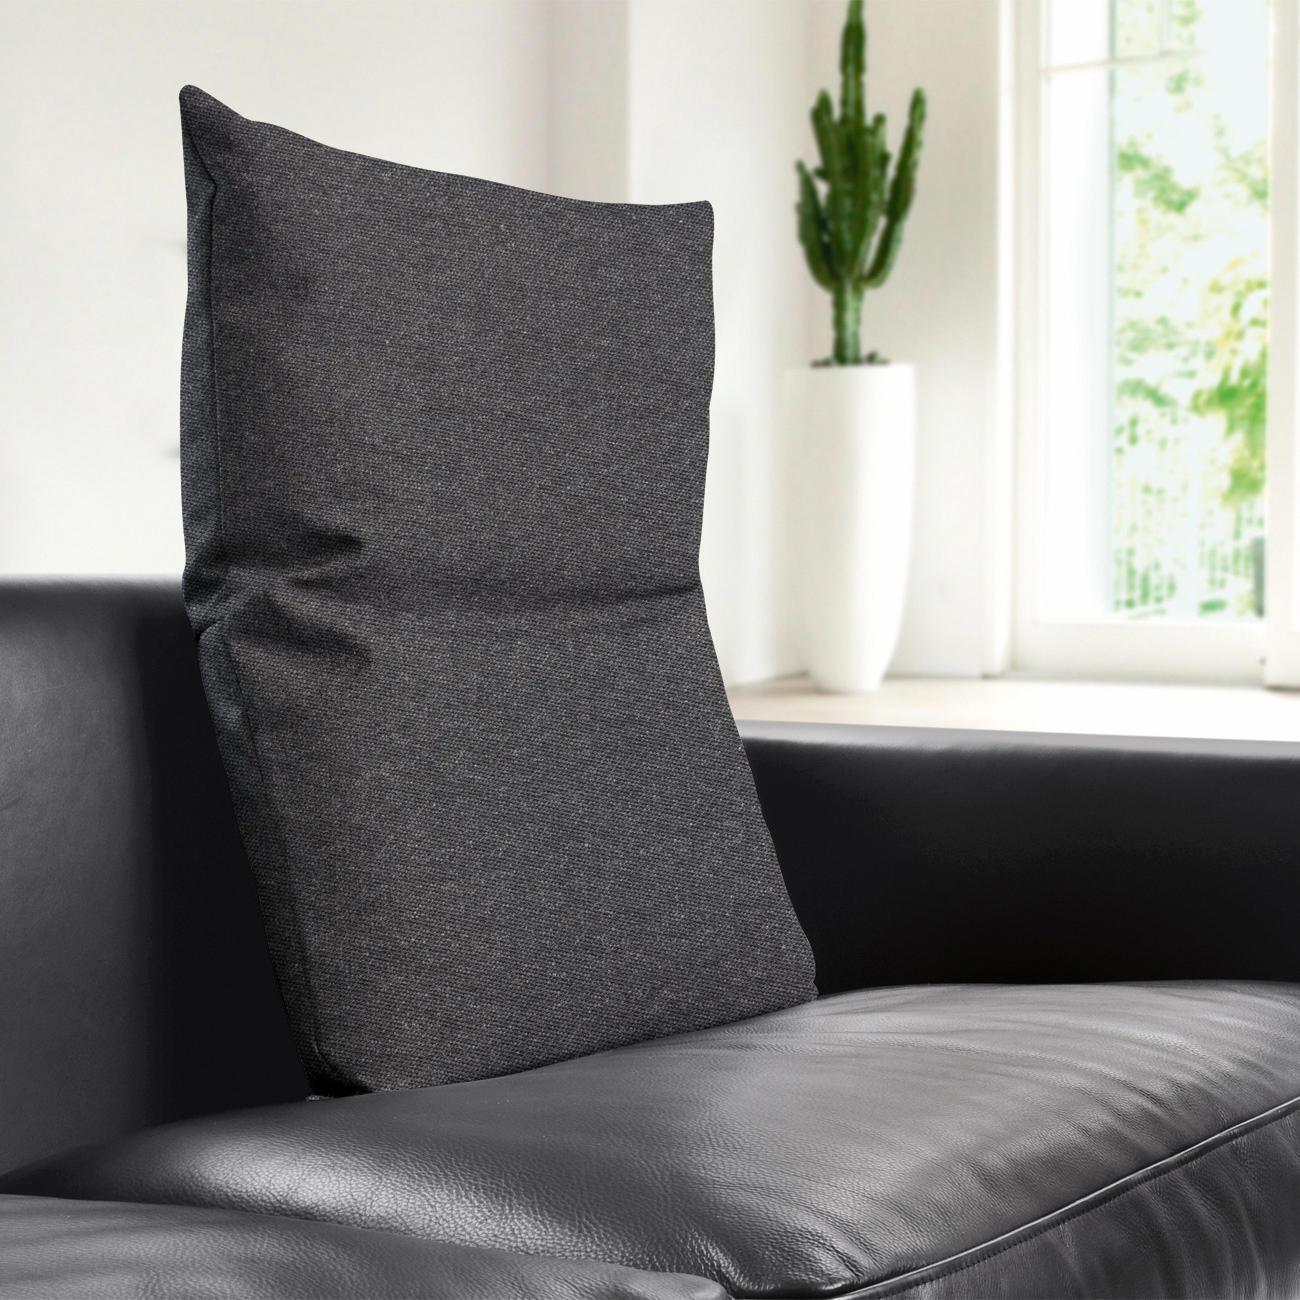 bullfrog r ckenkissen f r sofas sessel in versch farben. Black Bedroom Furniture Sets. Home Design Ideas